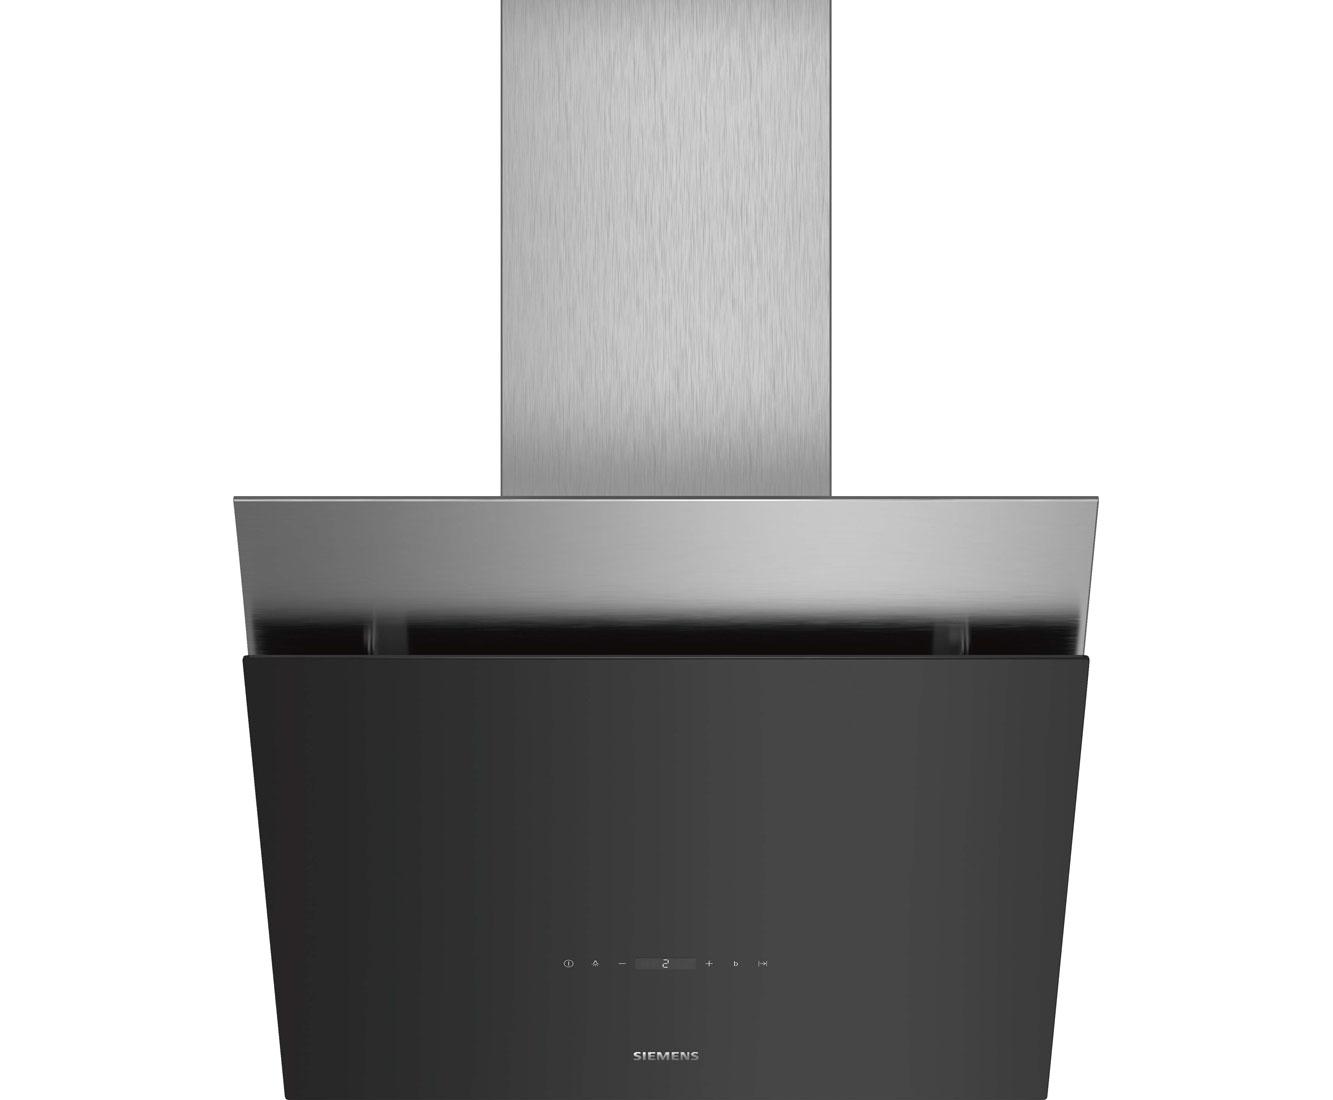 Dunstabzugshaube Kopffrei Siemens 2021